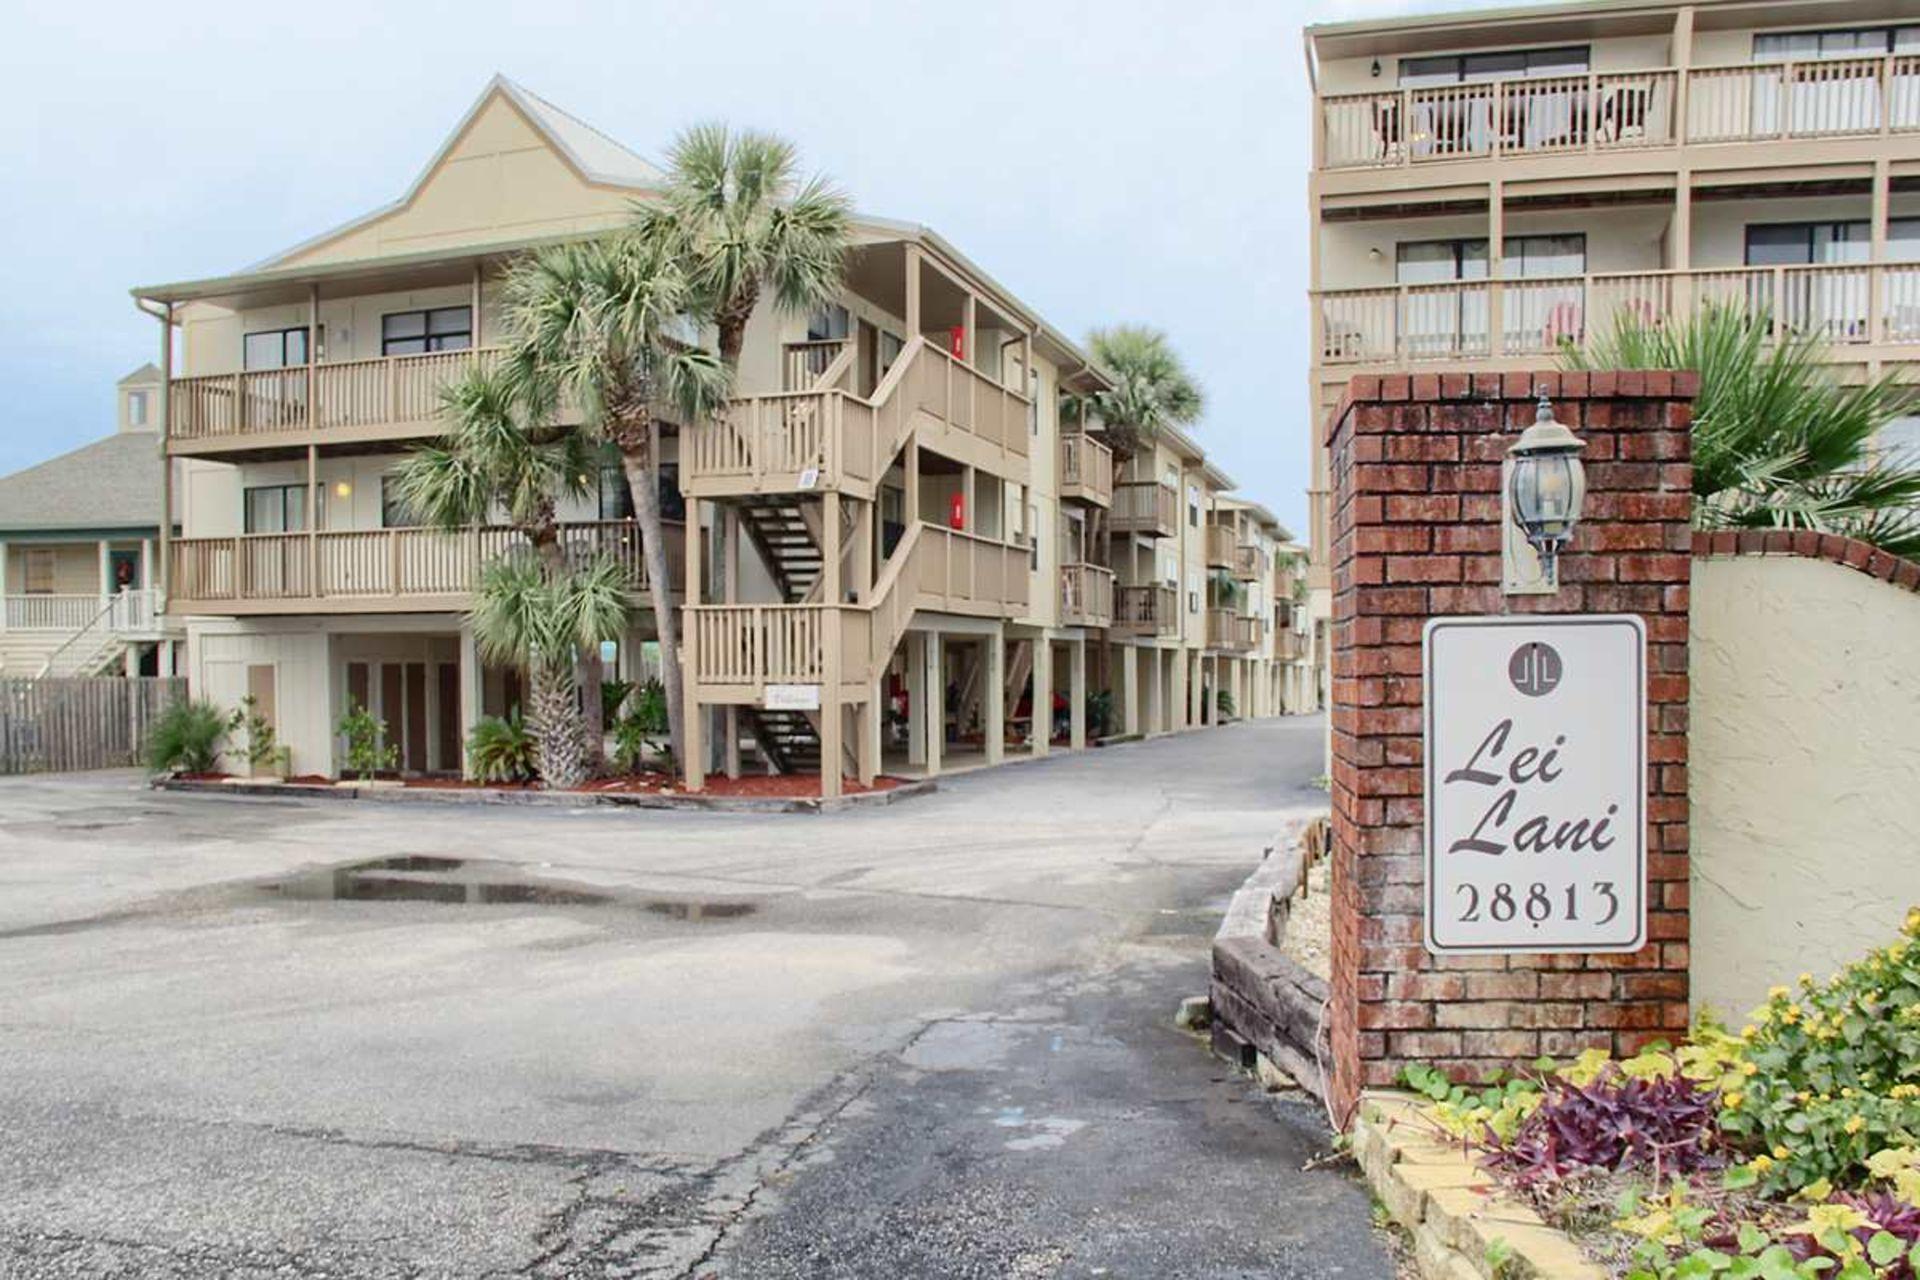 Homes and Condos Under $250,000